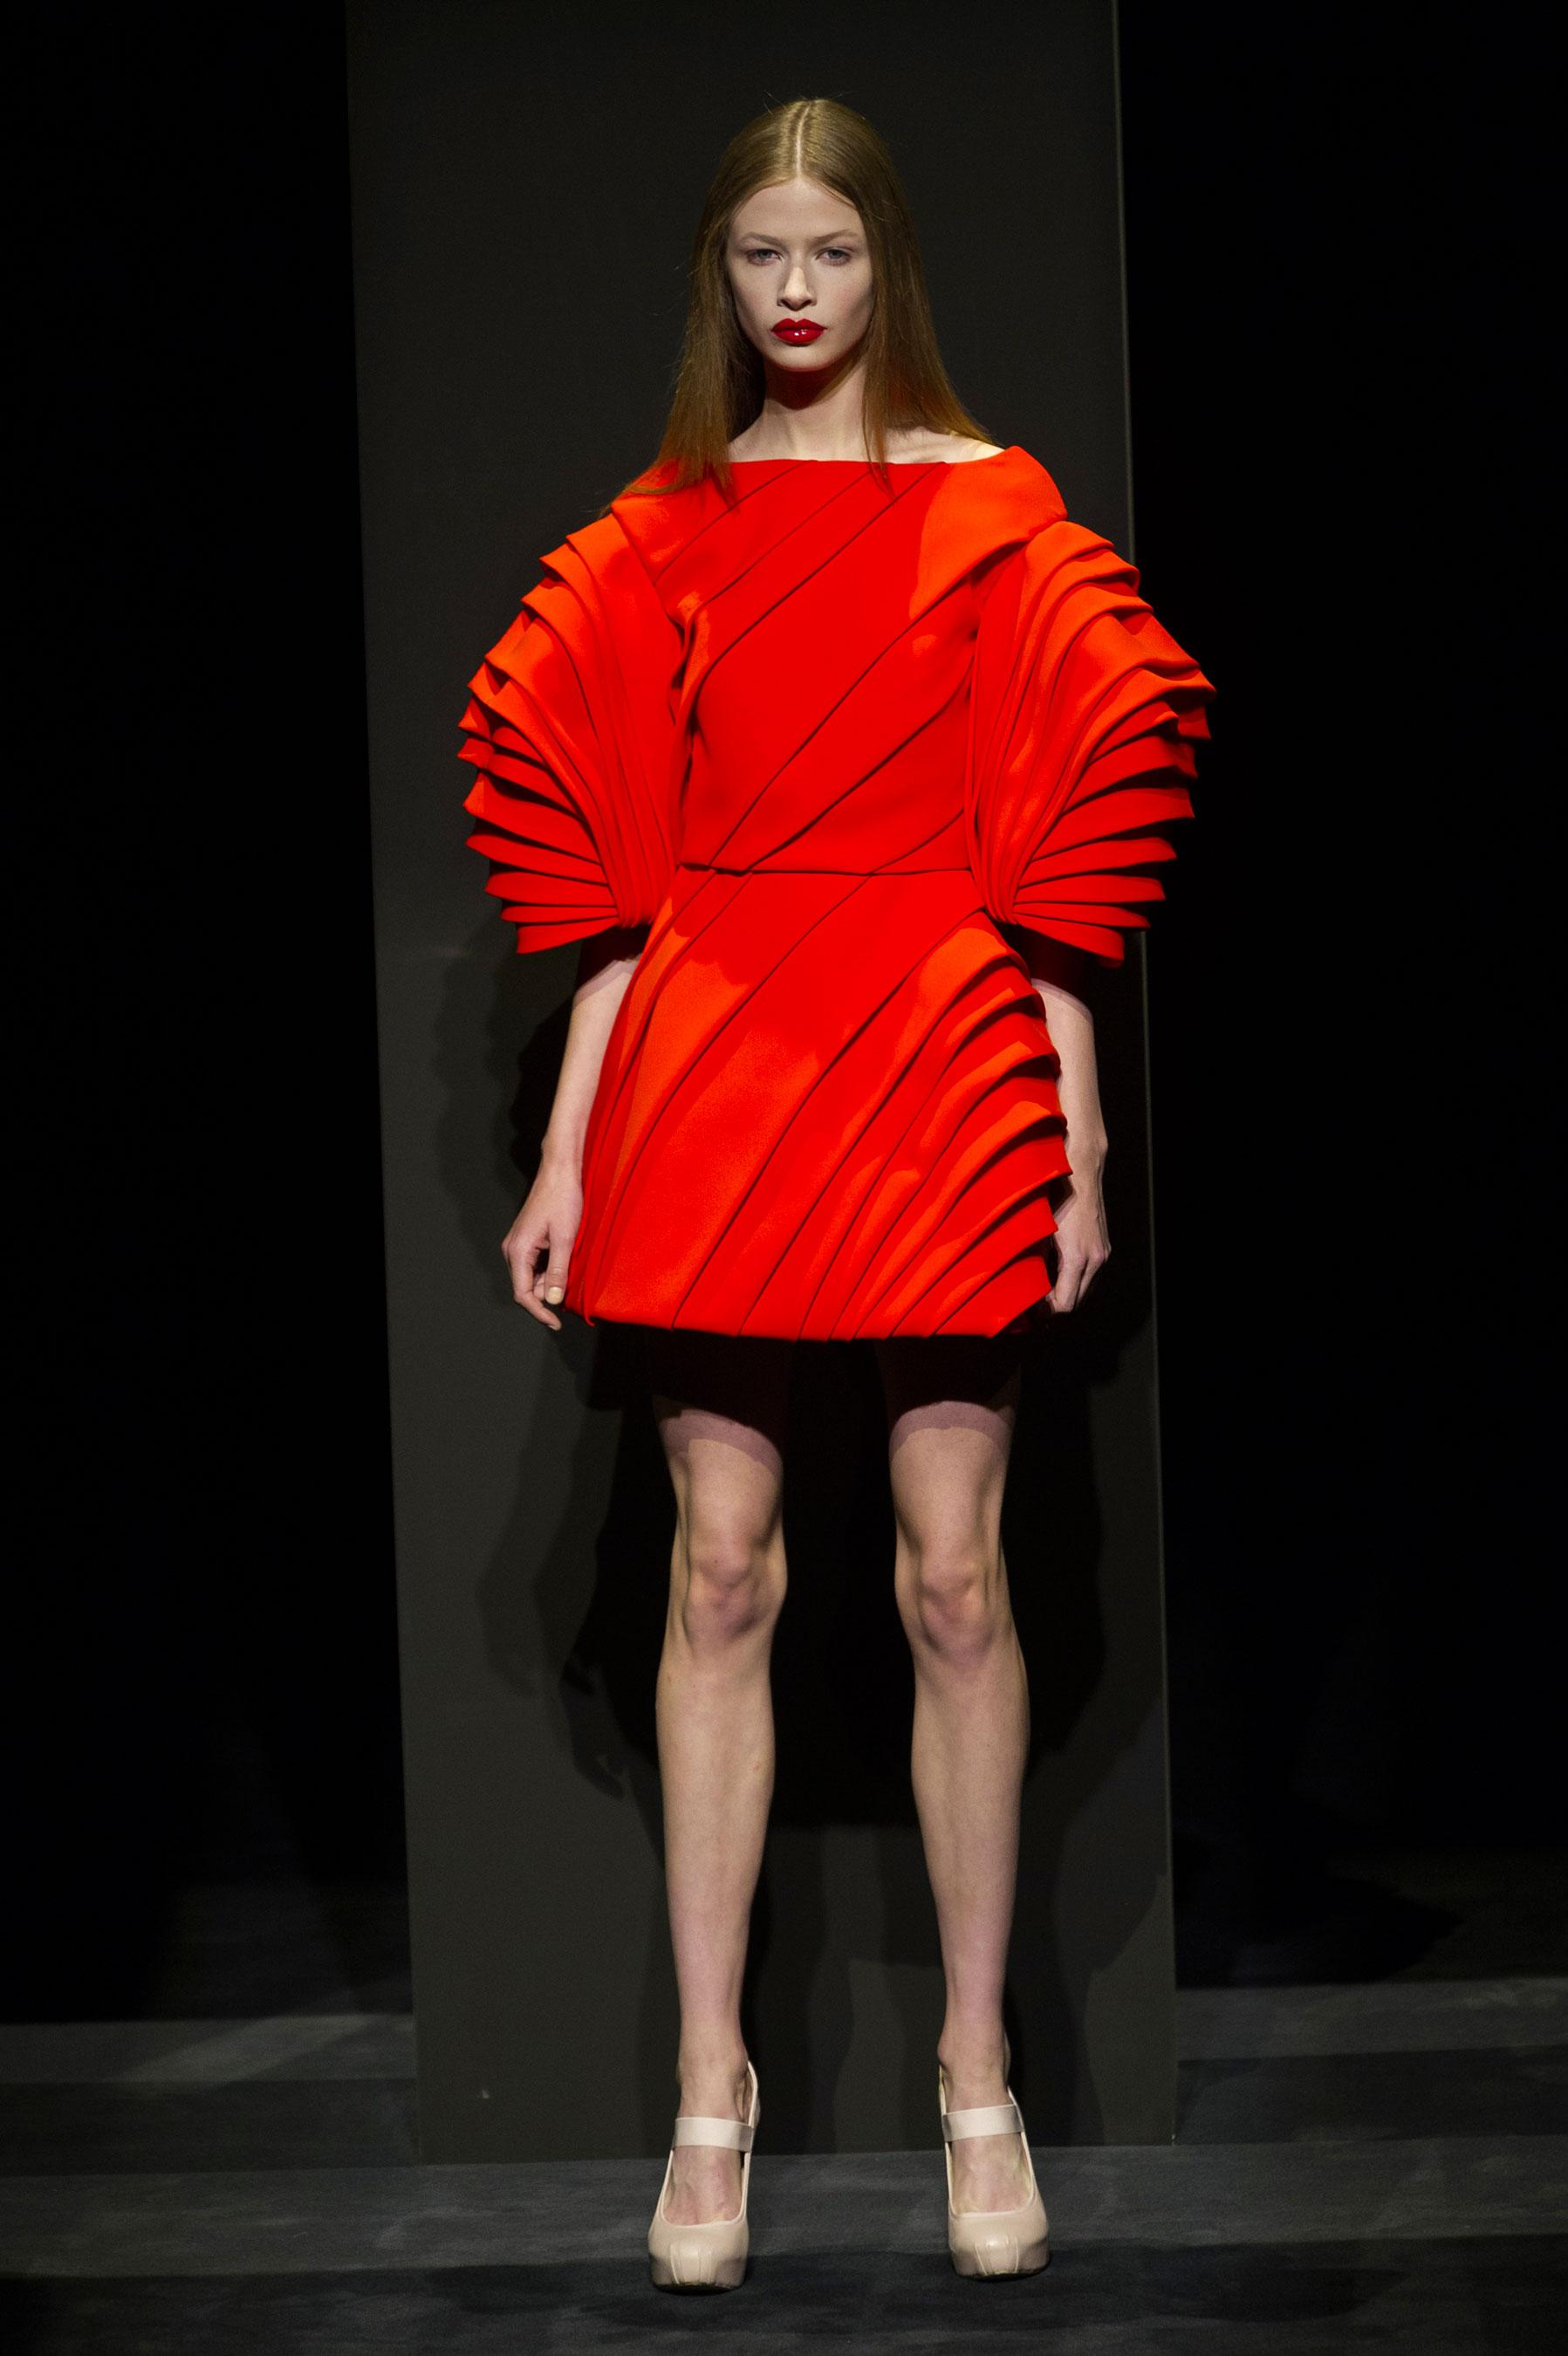 d fil dice kayek automne hiver 2014 2015 haute couture. Black Bedroom Furniture Sets. Home Design Ideas